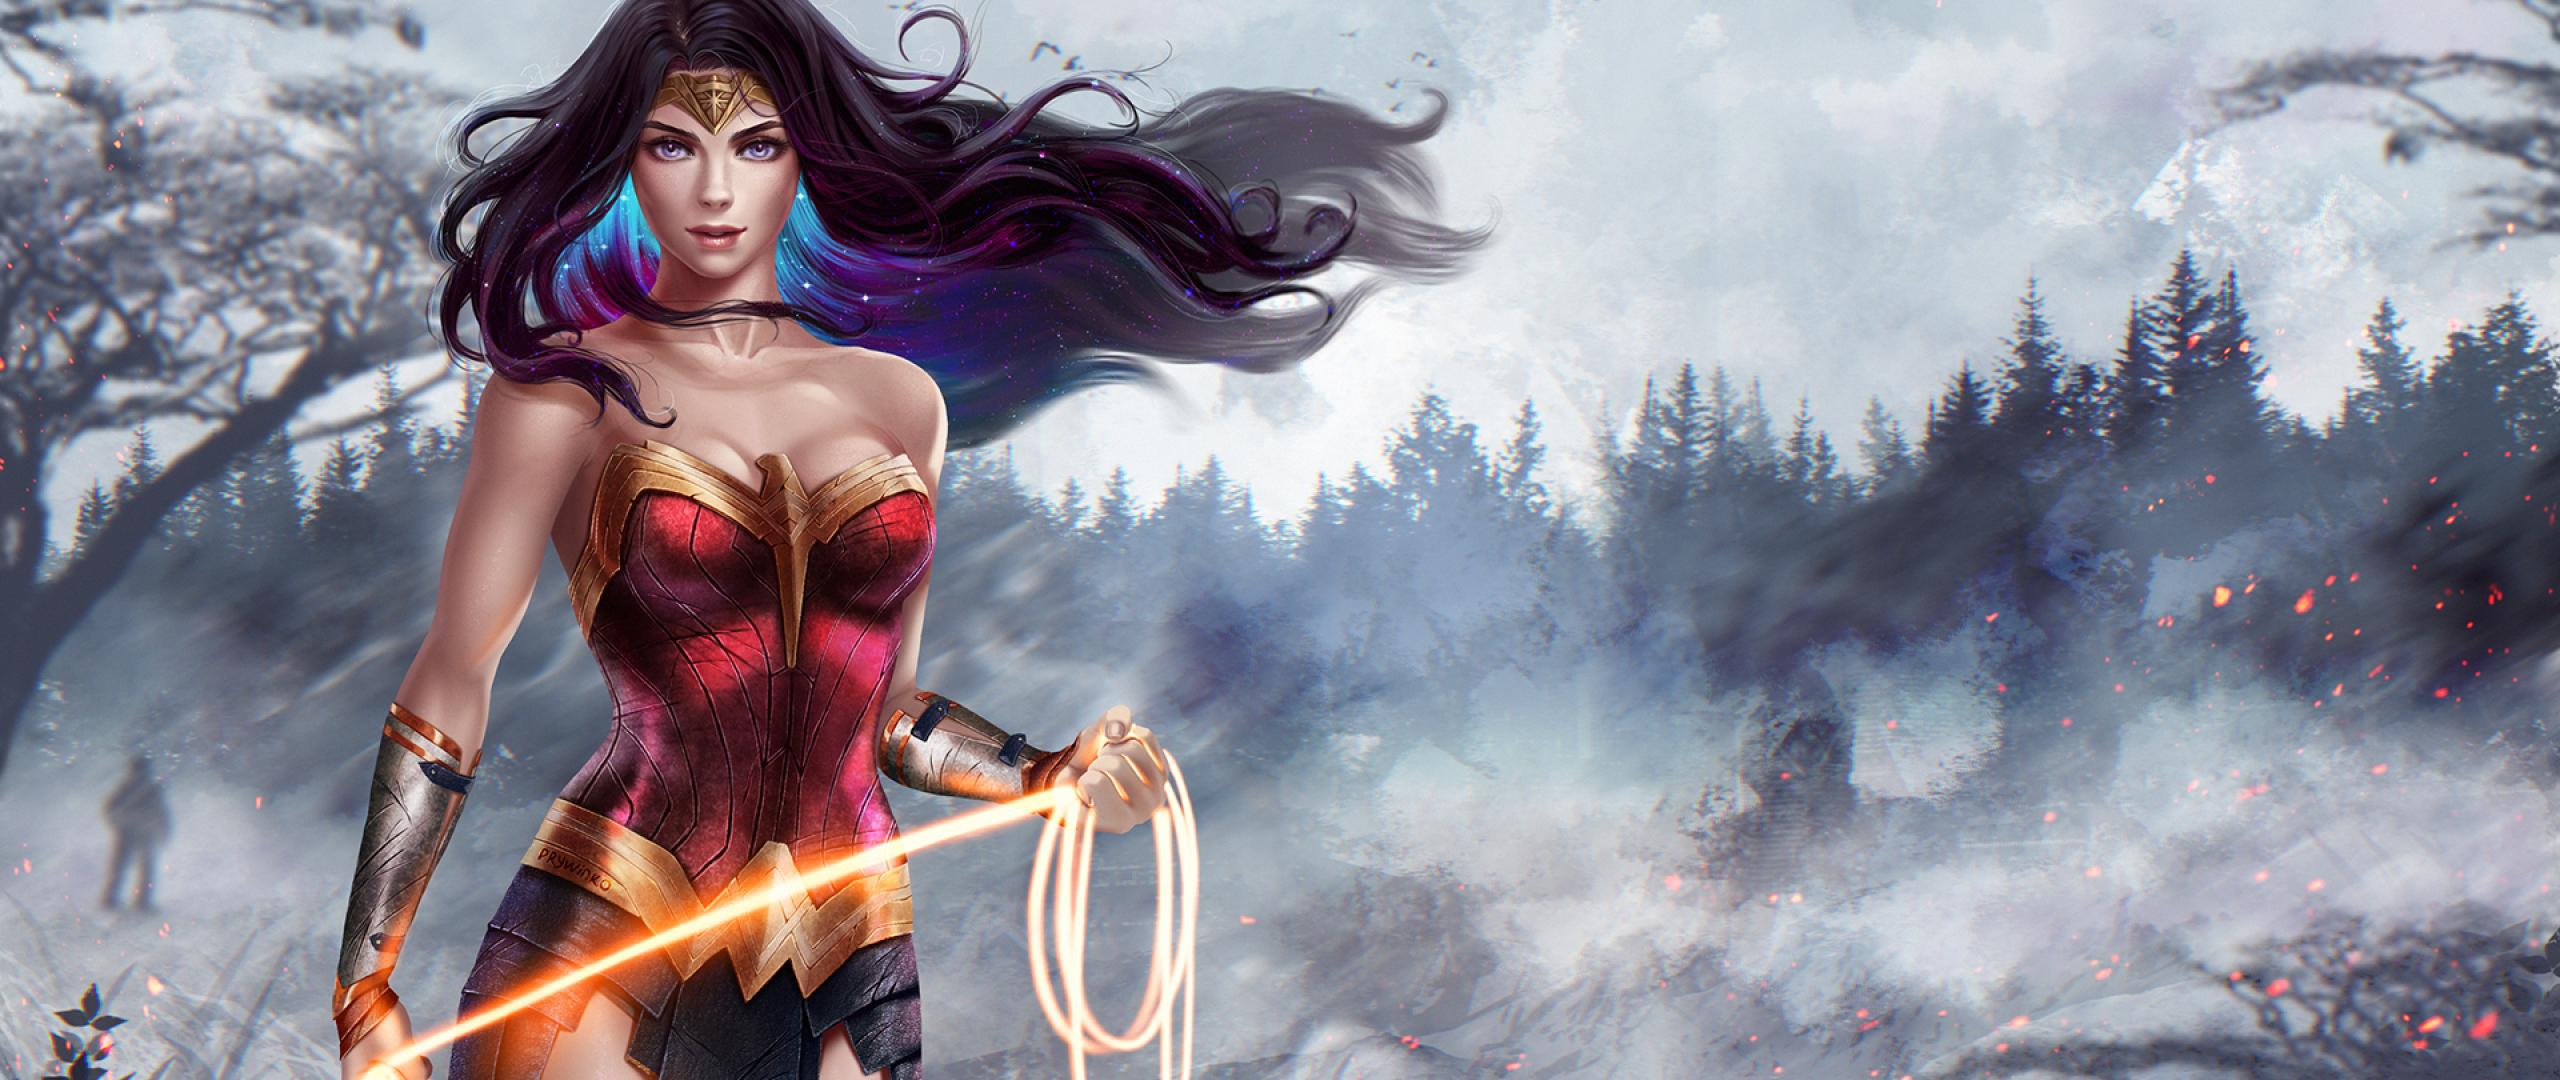 Wonder Woman Superhero Artwork, Full HD Wallpaper